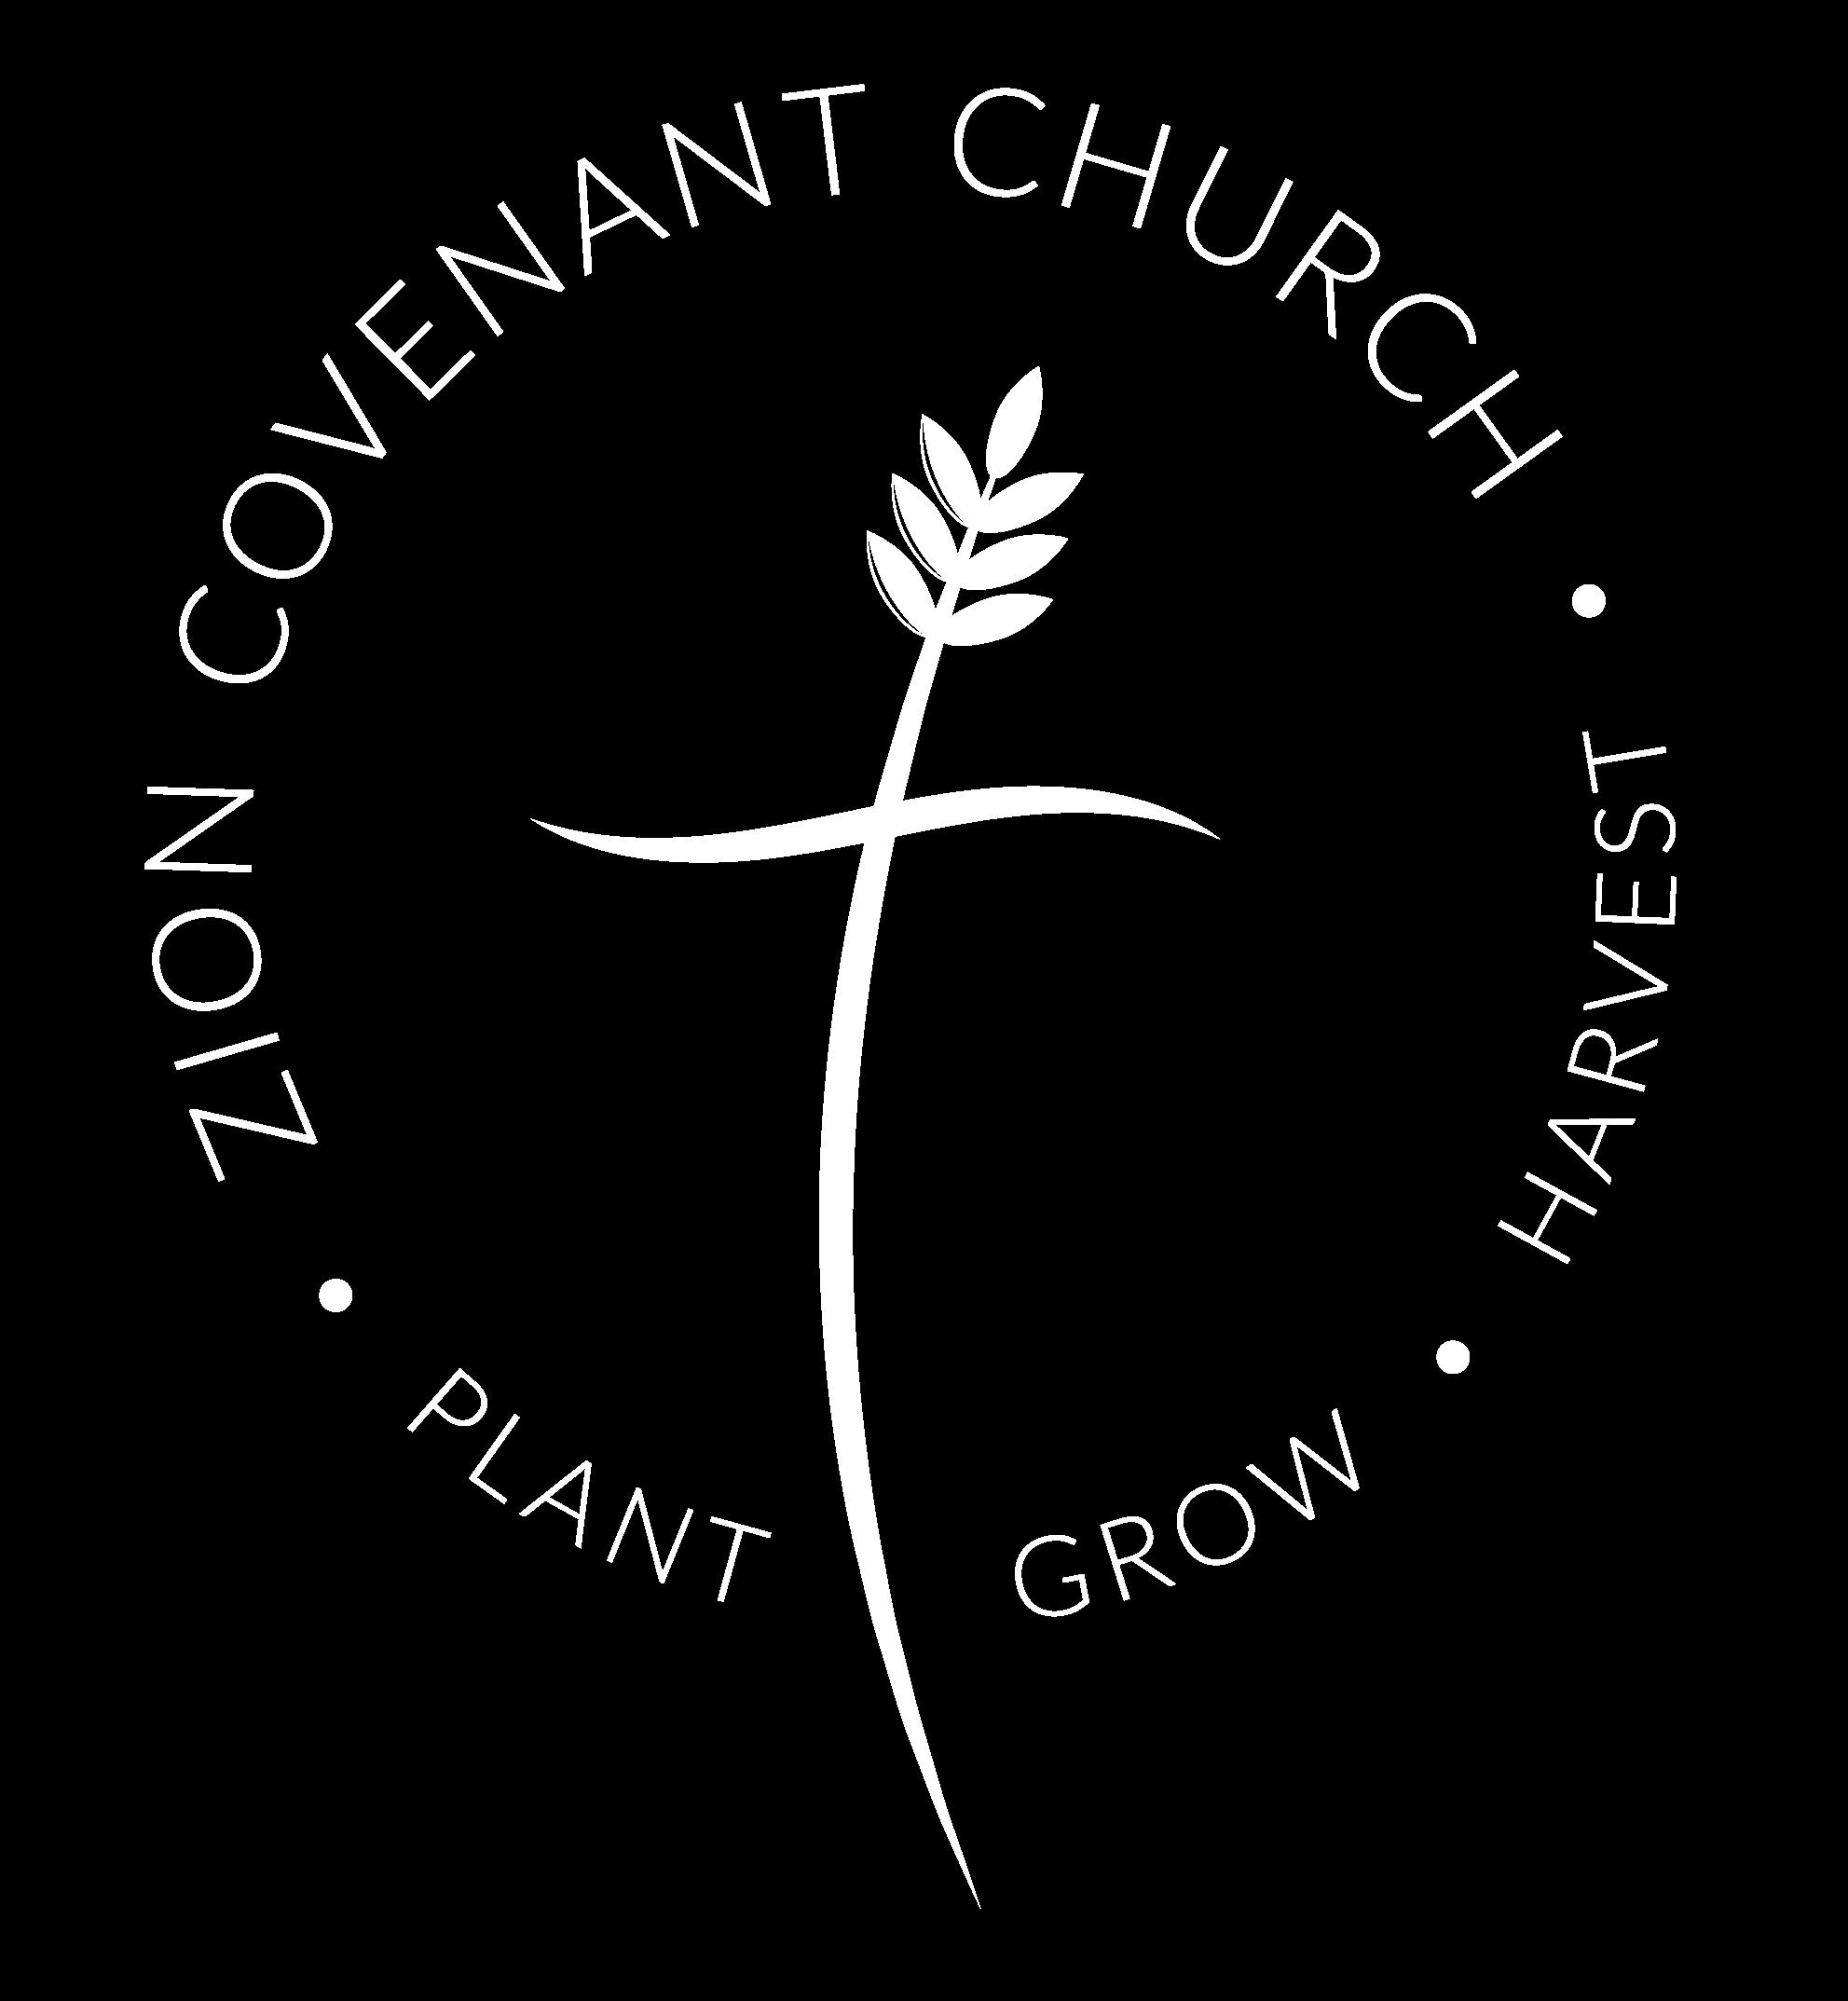 Zion Covenant Church Watermark